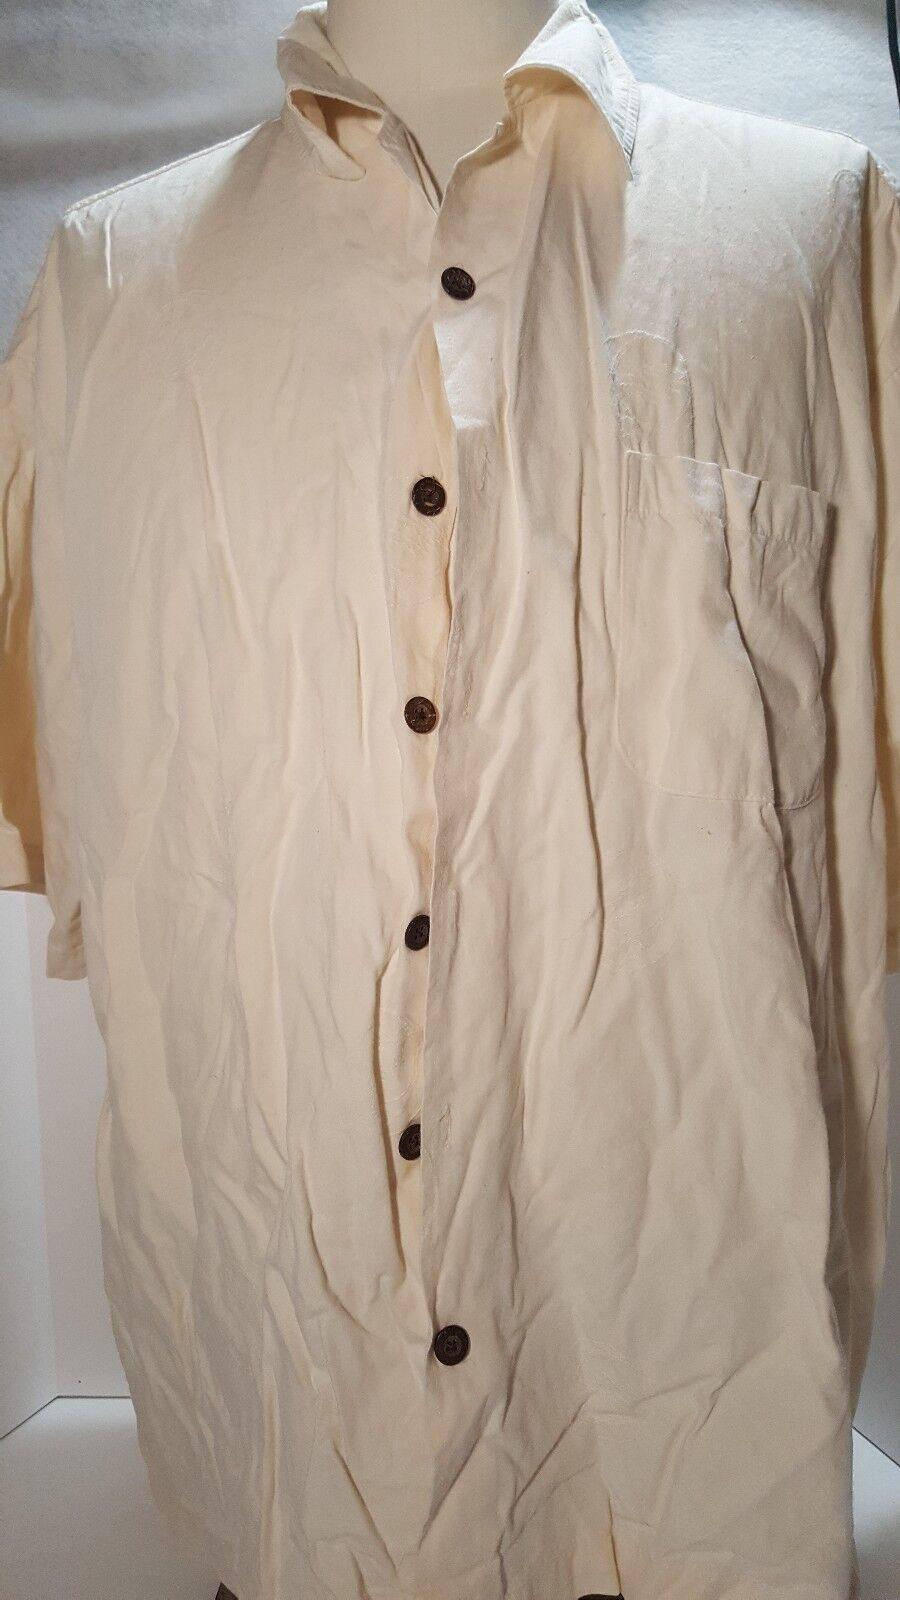 Vintage Grateful Dead by David Carey Button Up Short Sleeve Shirt Size 2XL